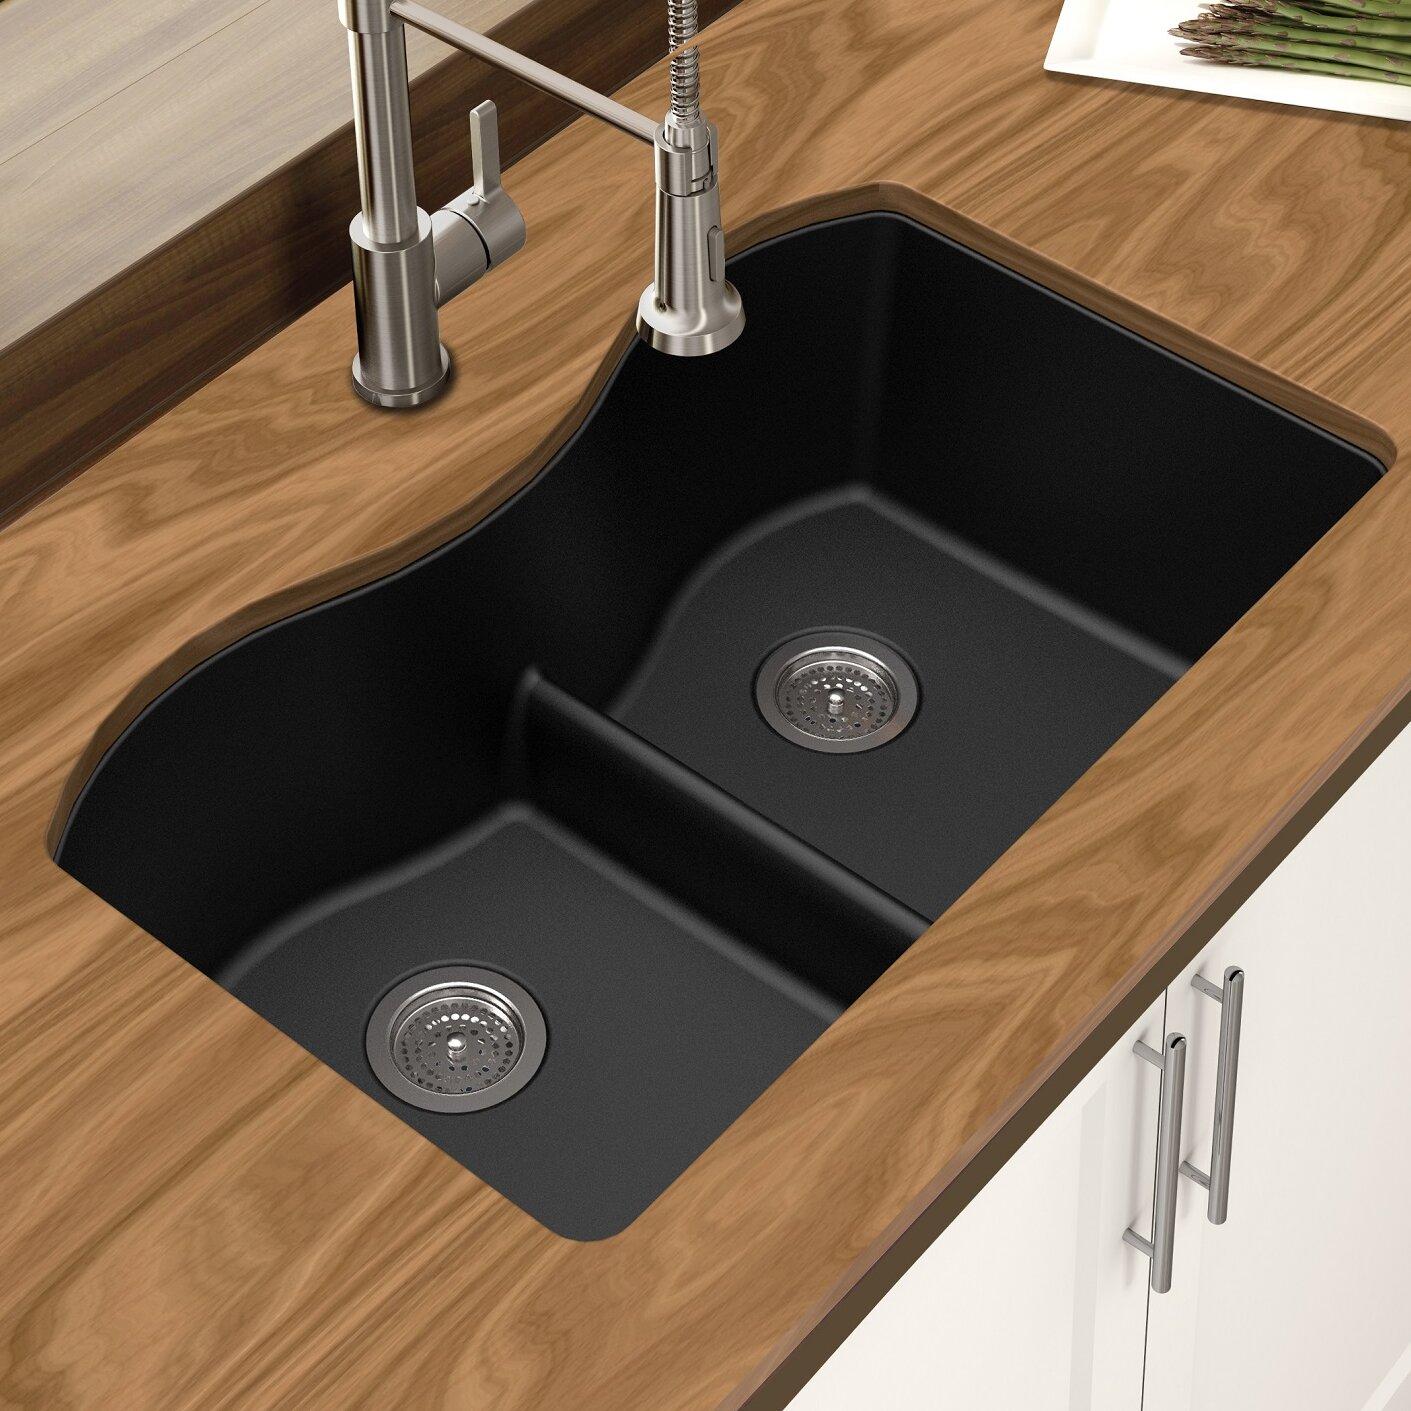 WGBL10307 Granite 33  L x 18  W Double Bowl Undermount Kitchen Sink & Winpro Granite 33